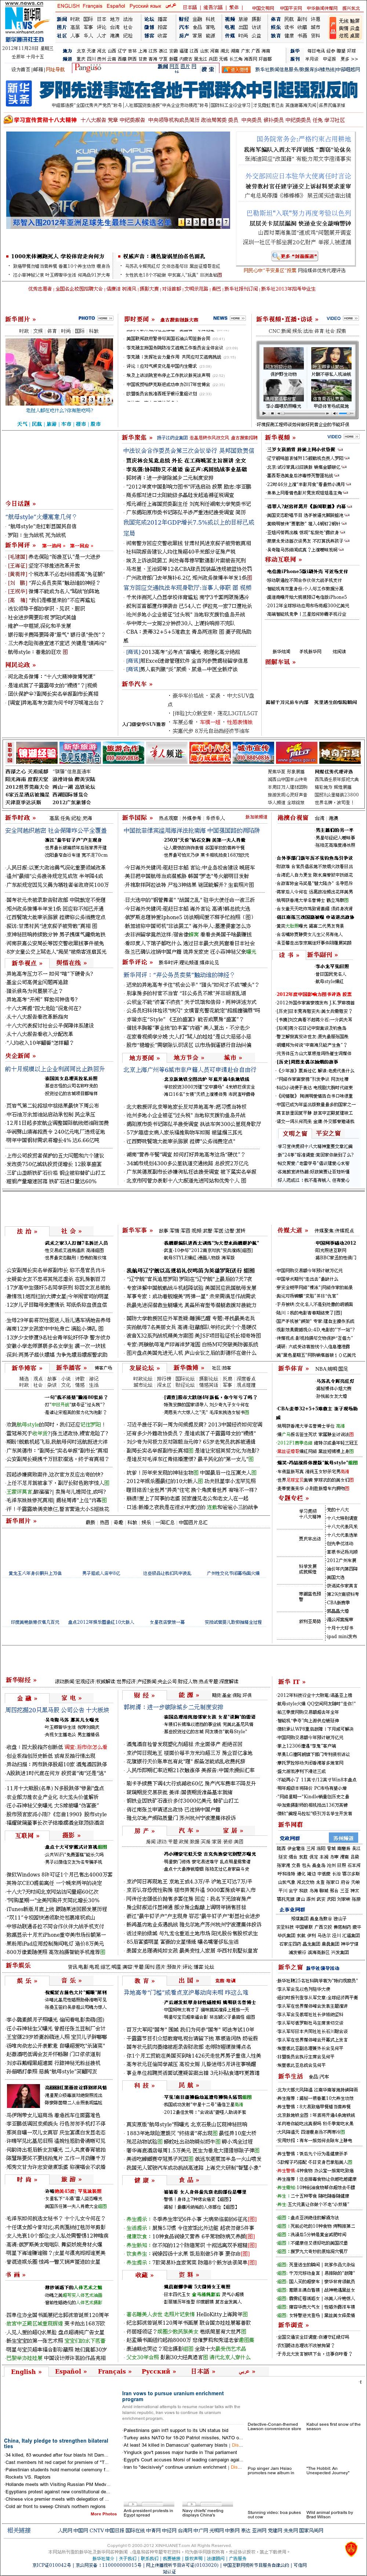 Xinhua at Wednesday Nov. 28, 2012, 7:33 p.m. UTC